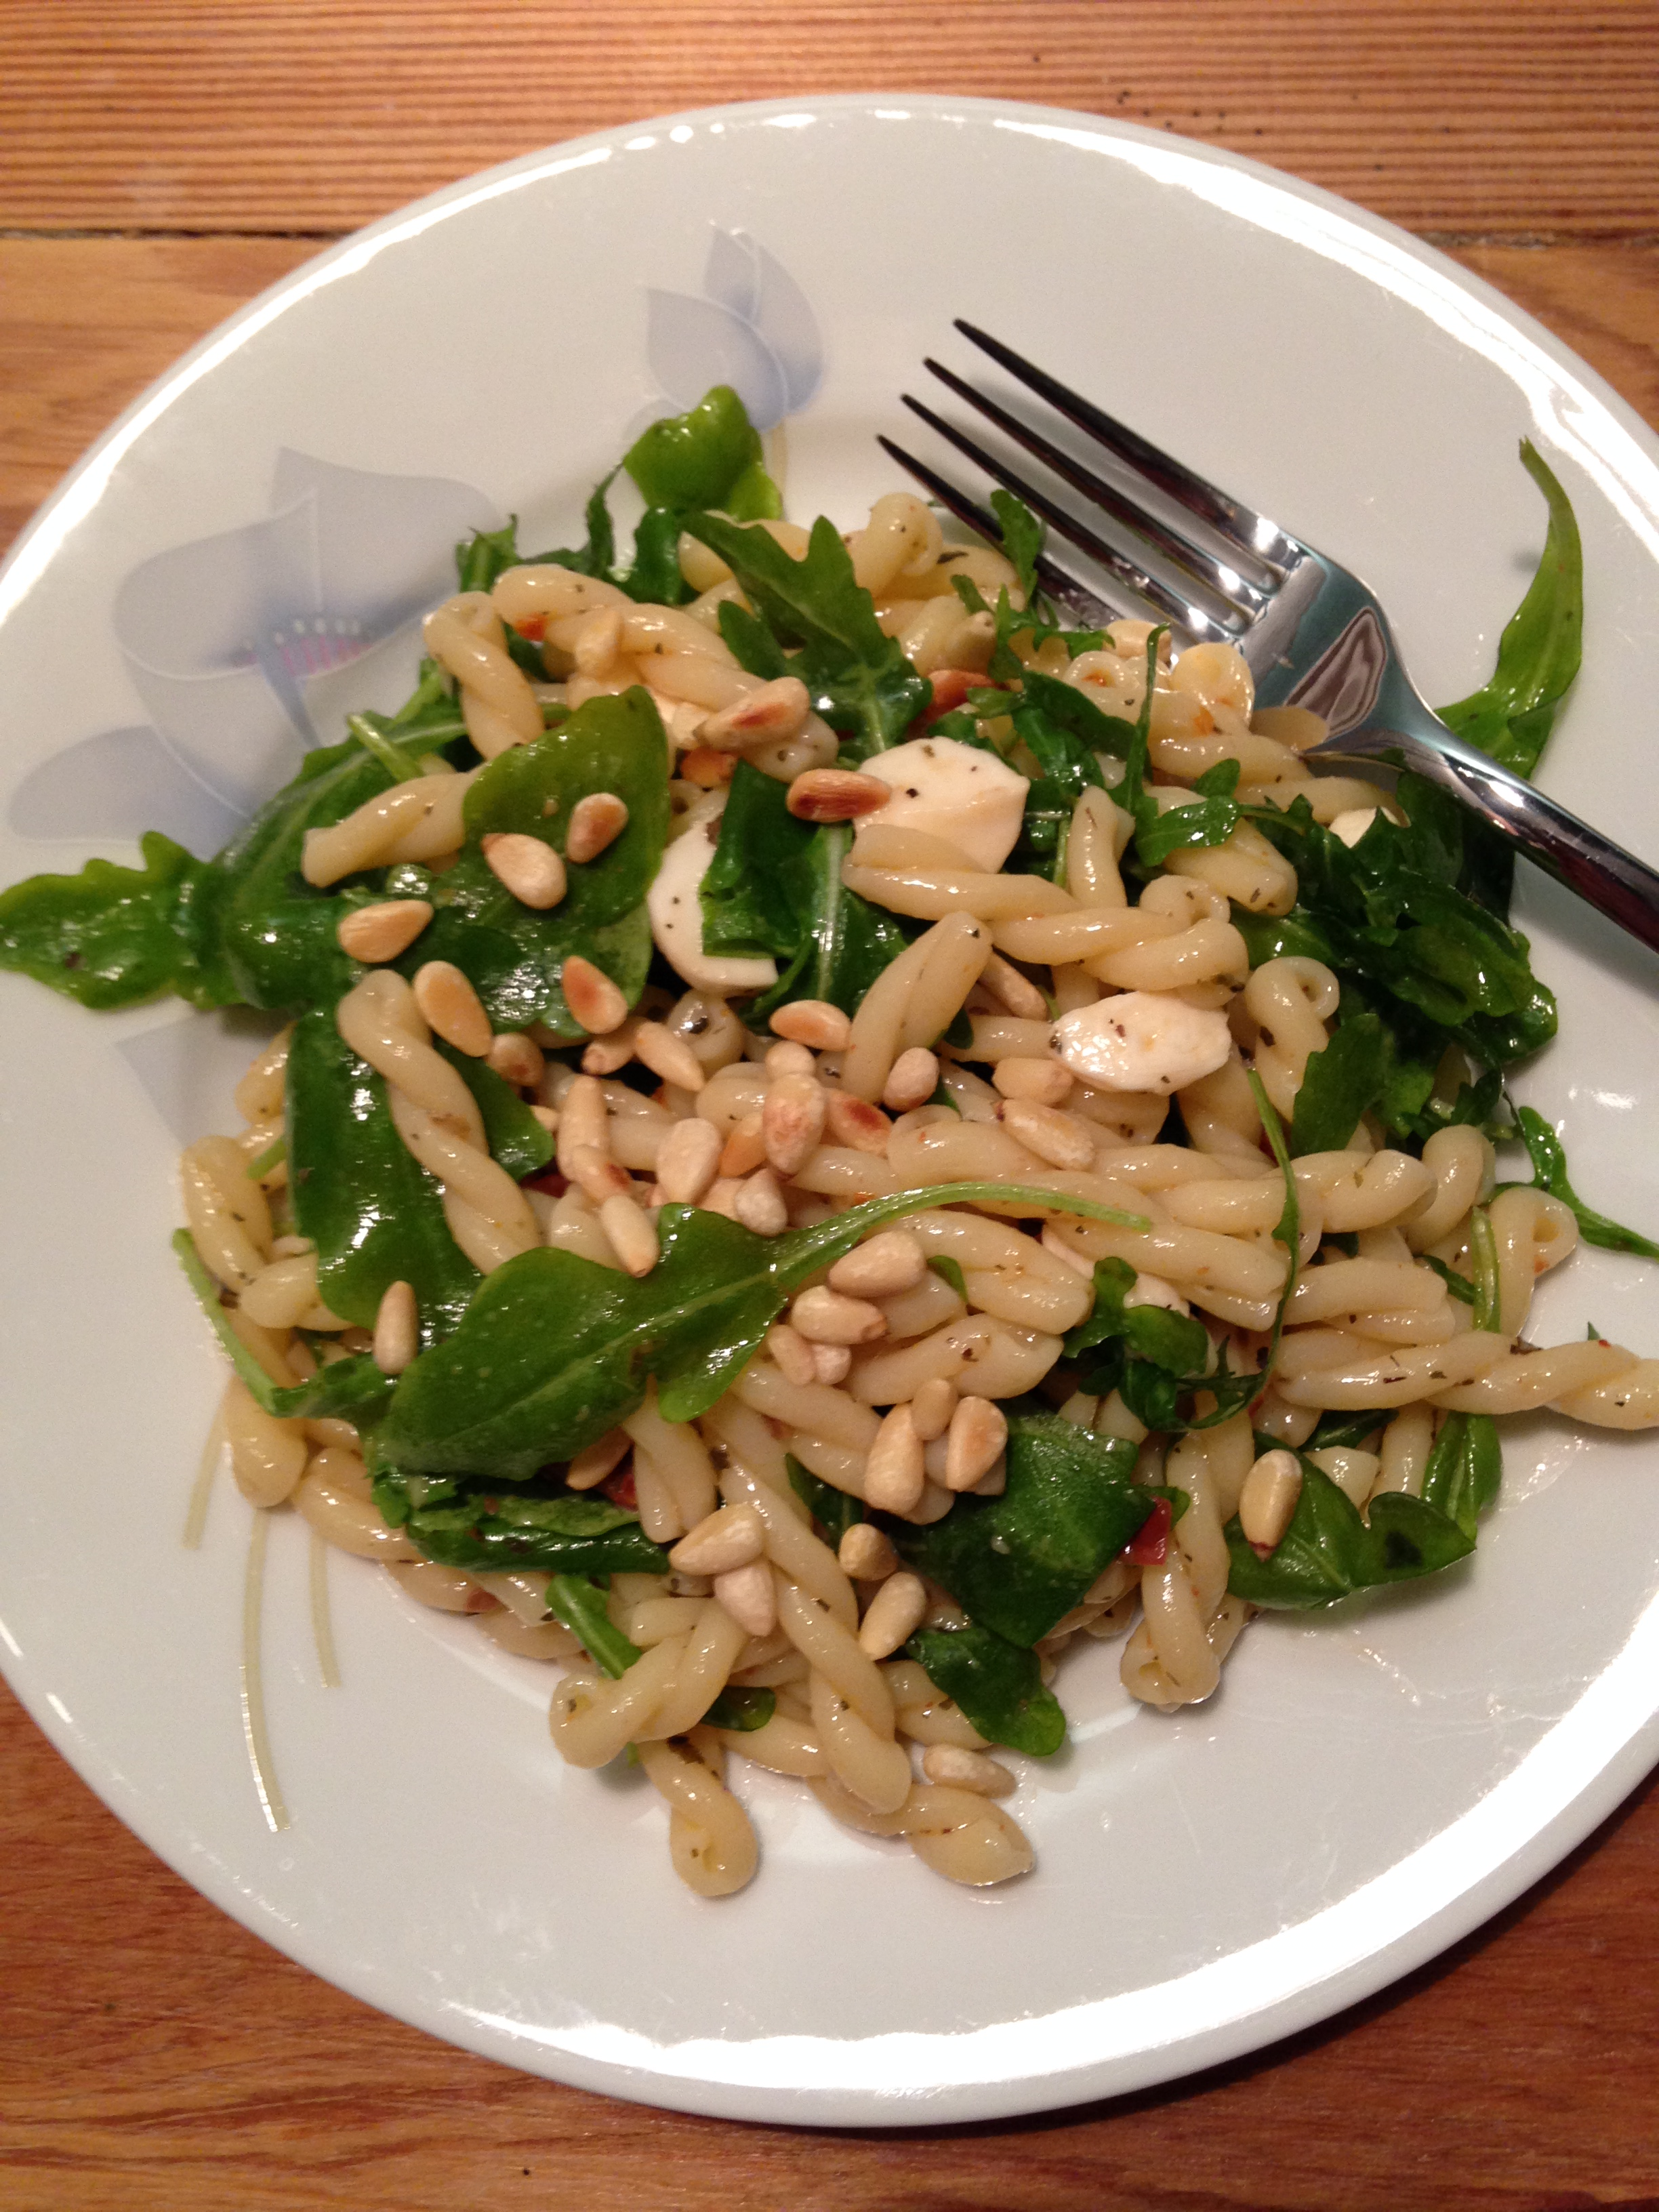 pasta rucola salat mit getrockneten tomaten & pinienkerne | pasta rocket salad with sundried tomatoes & pine nuts | vegan